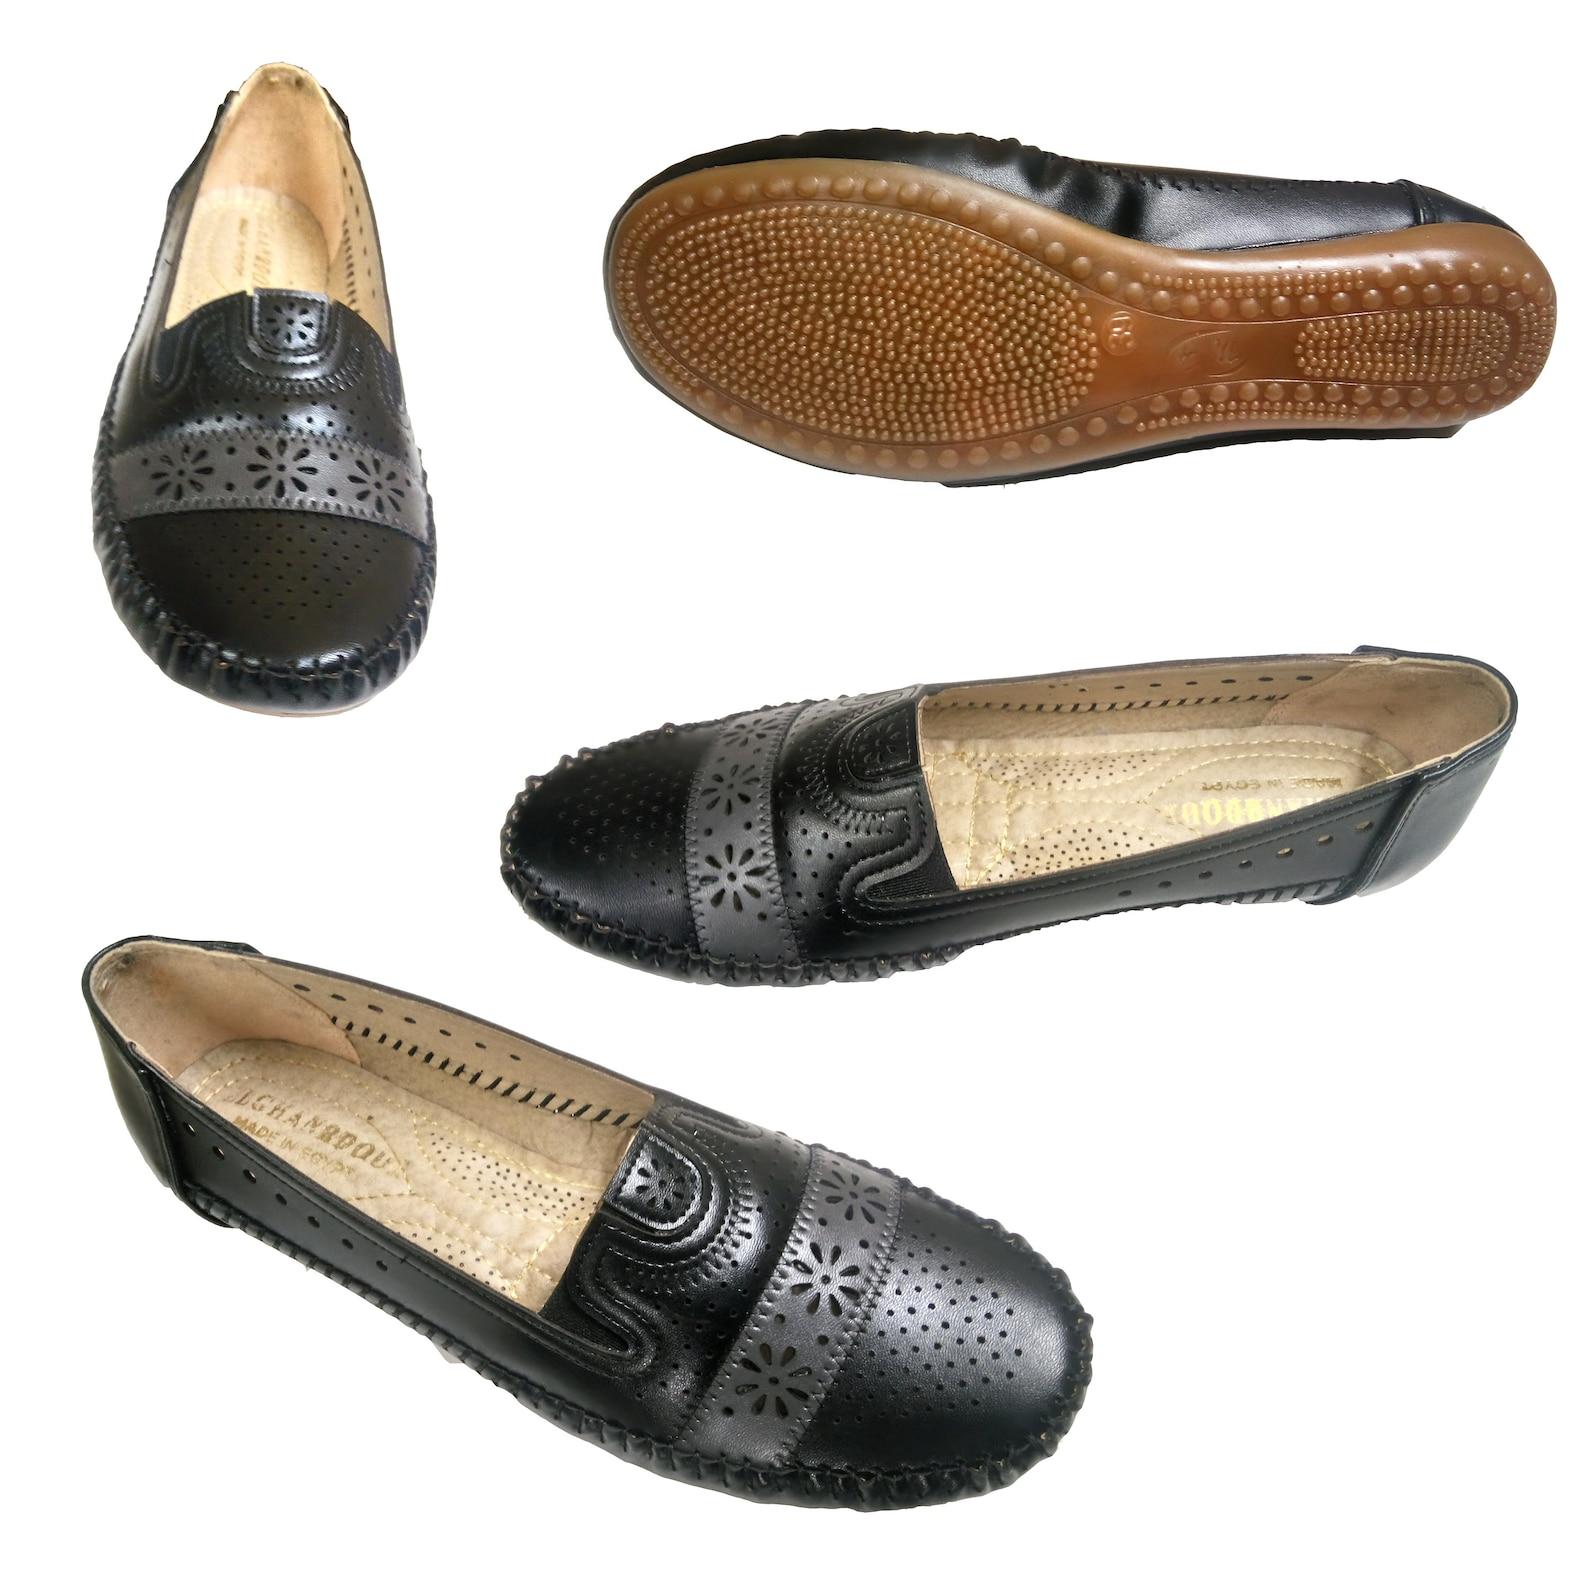 shoes flats women new ballet moccasins ballerina ladies comfort casual black 39